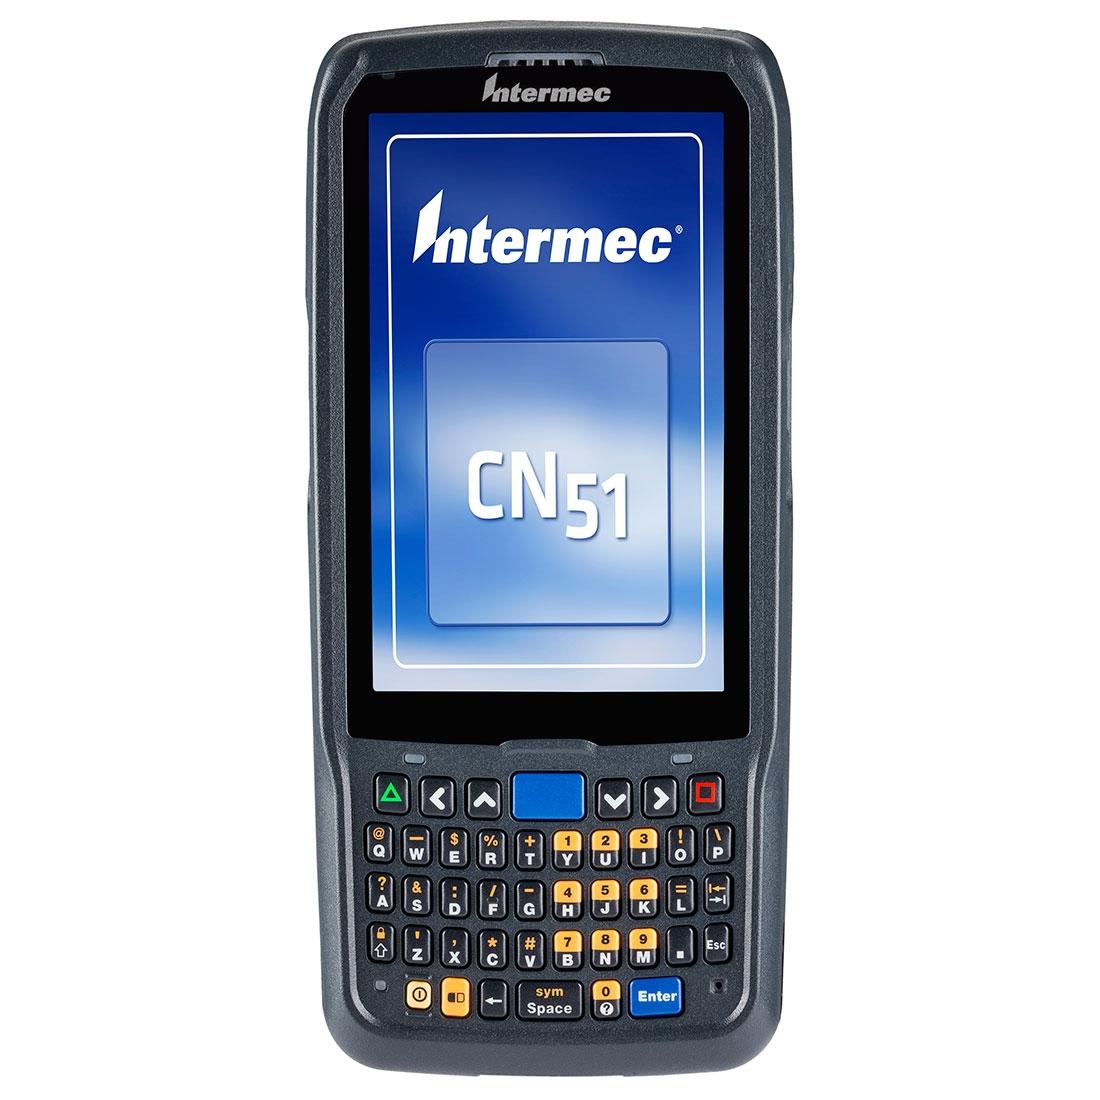 intermec-cn51-mobile-computer-cn51an1snf1w1000-3.336